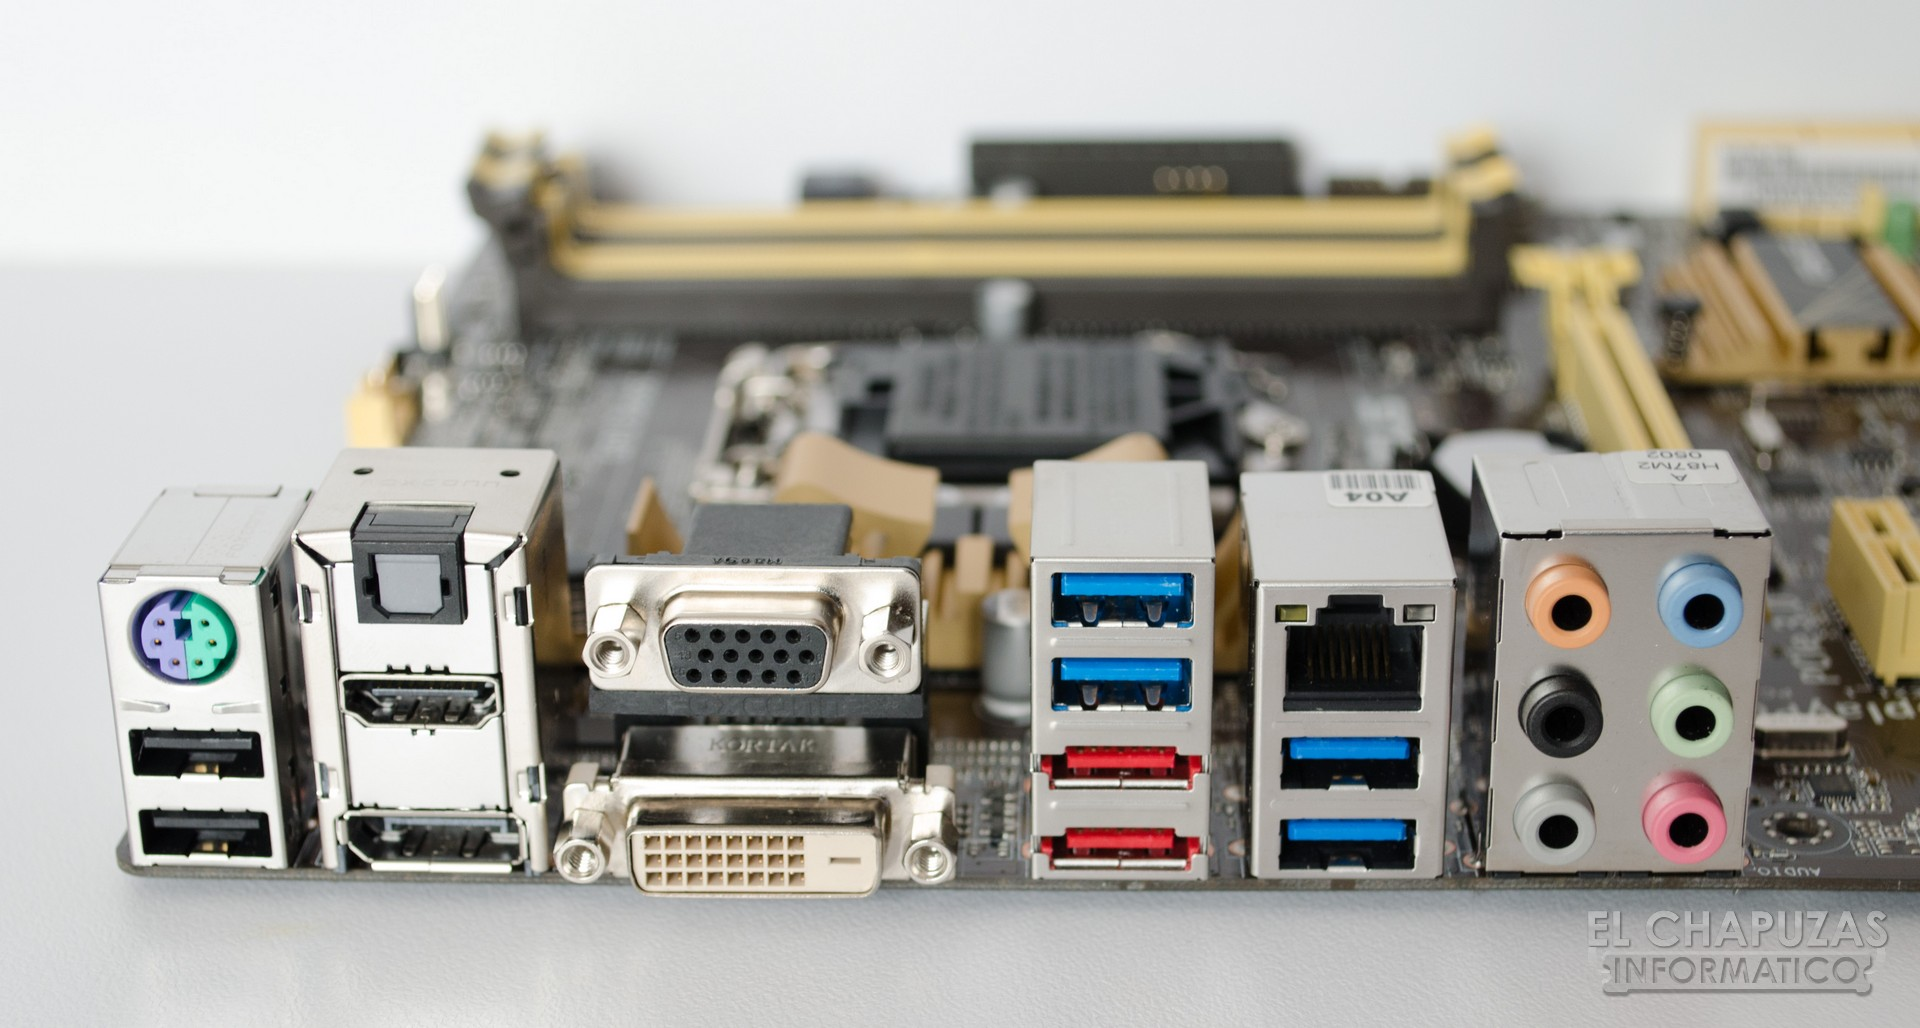 Review Asus H87m Pro